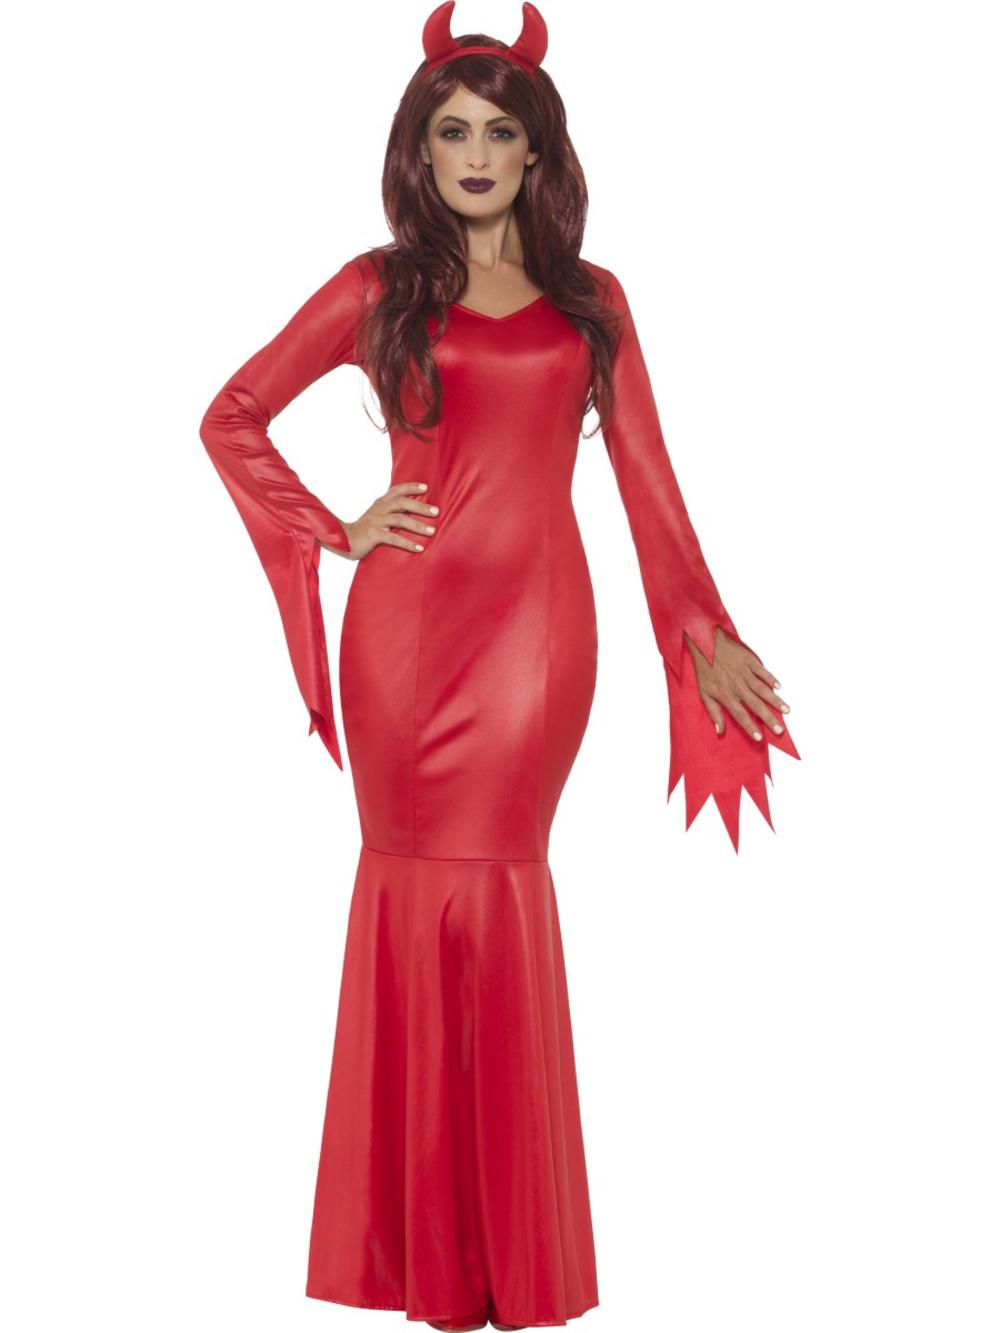 Devil Mistress Ladies Fancy Dress Gothic Demon Adults Halloween Costume Outfit